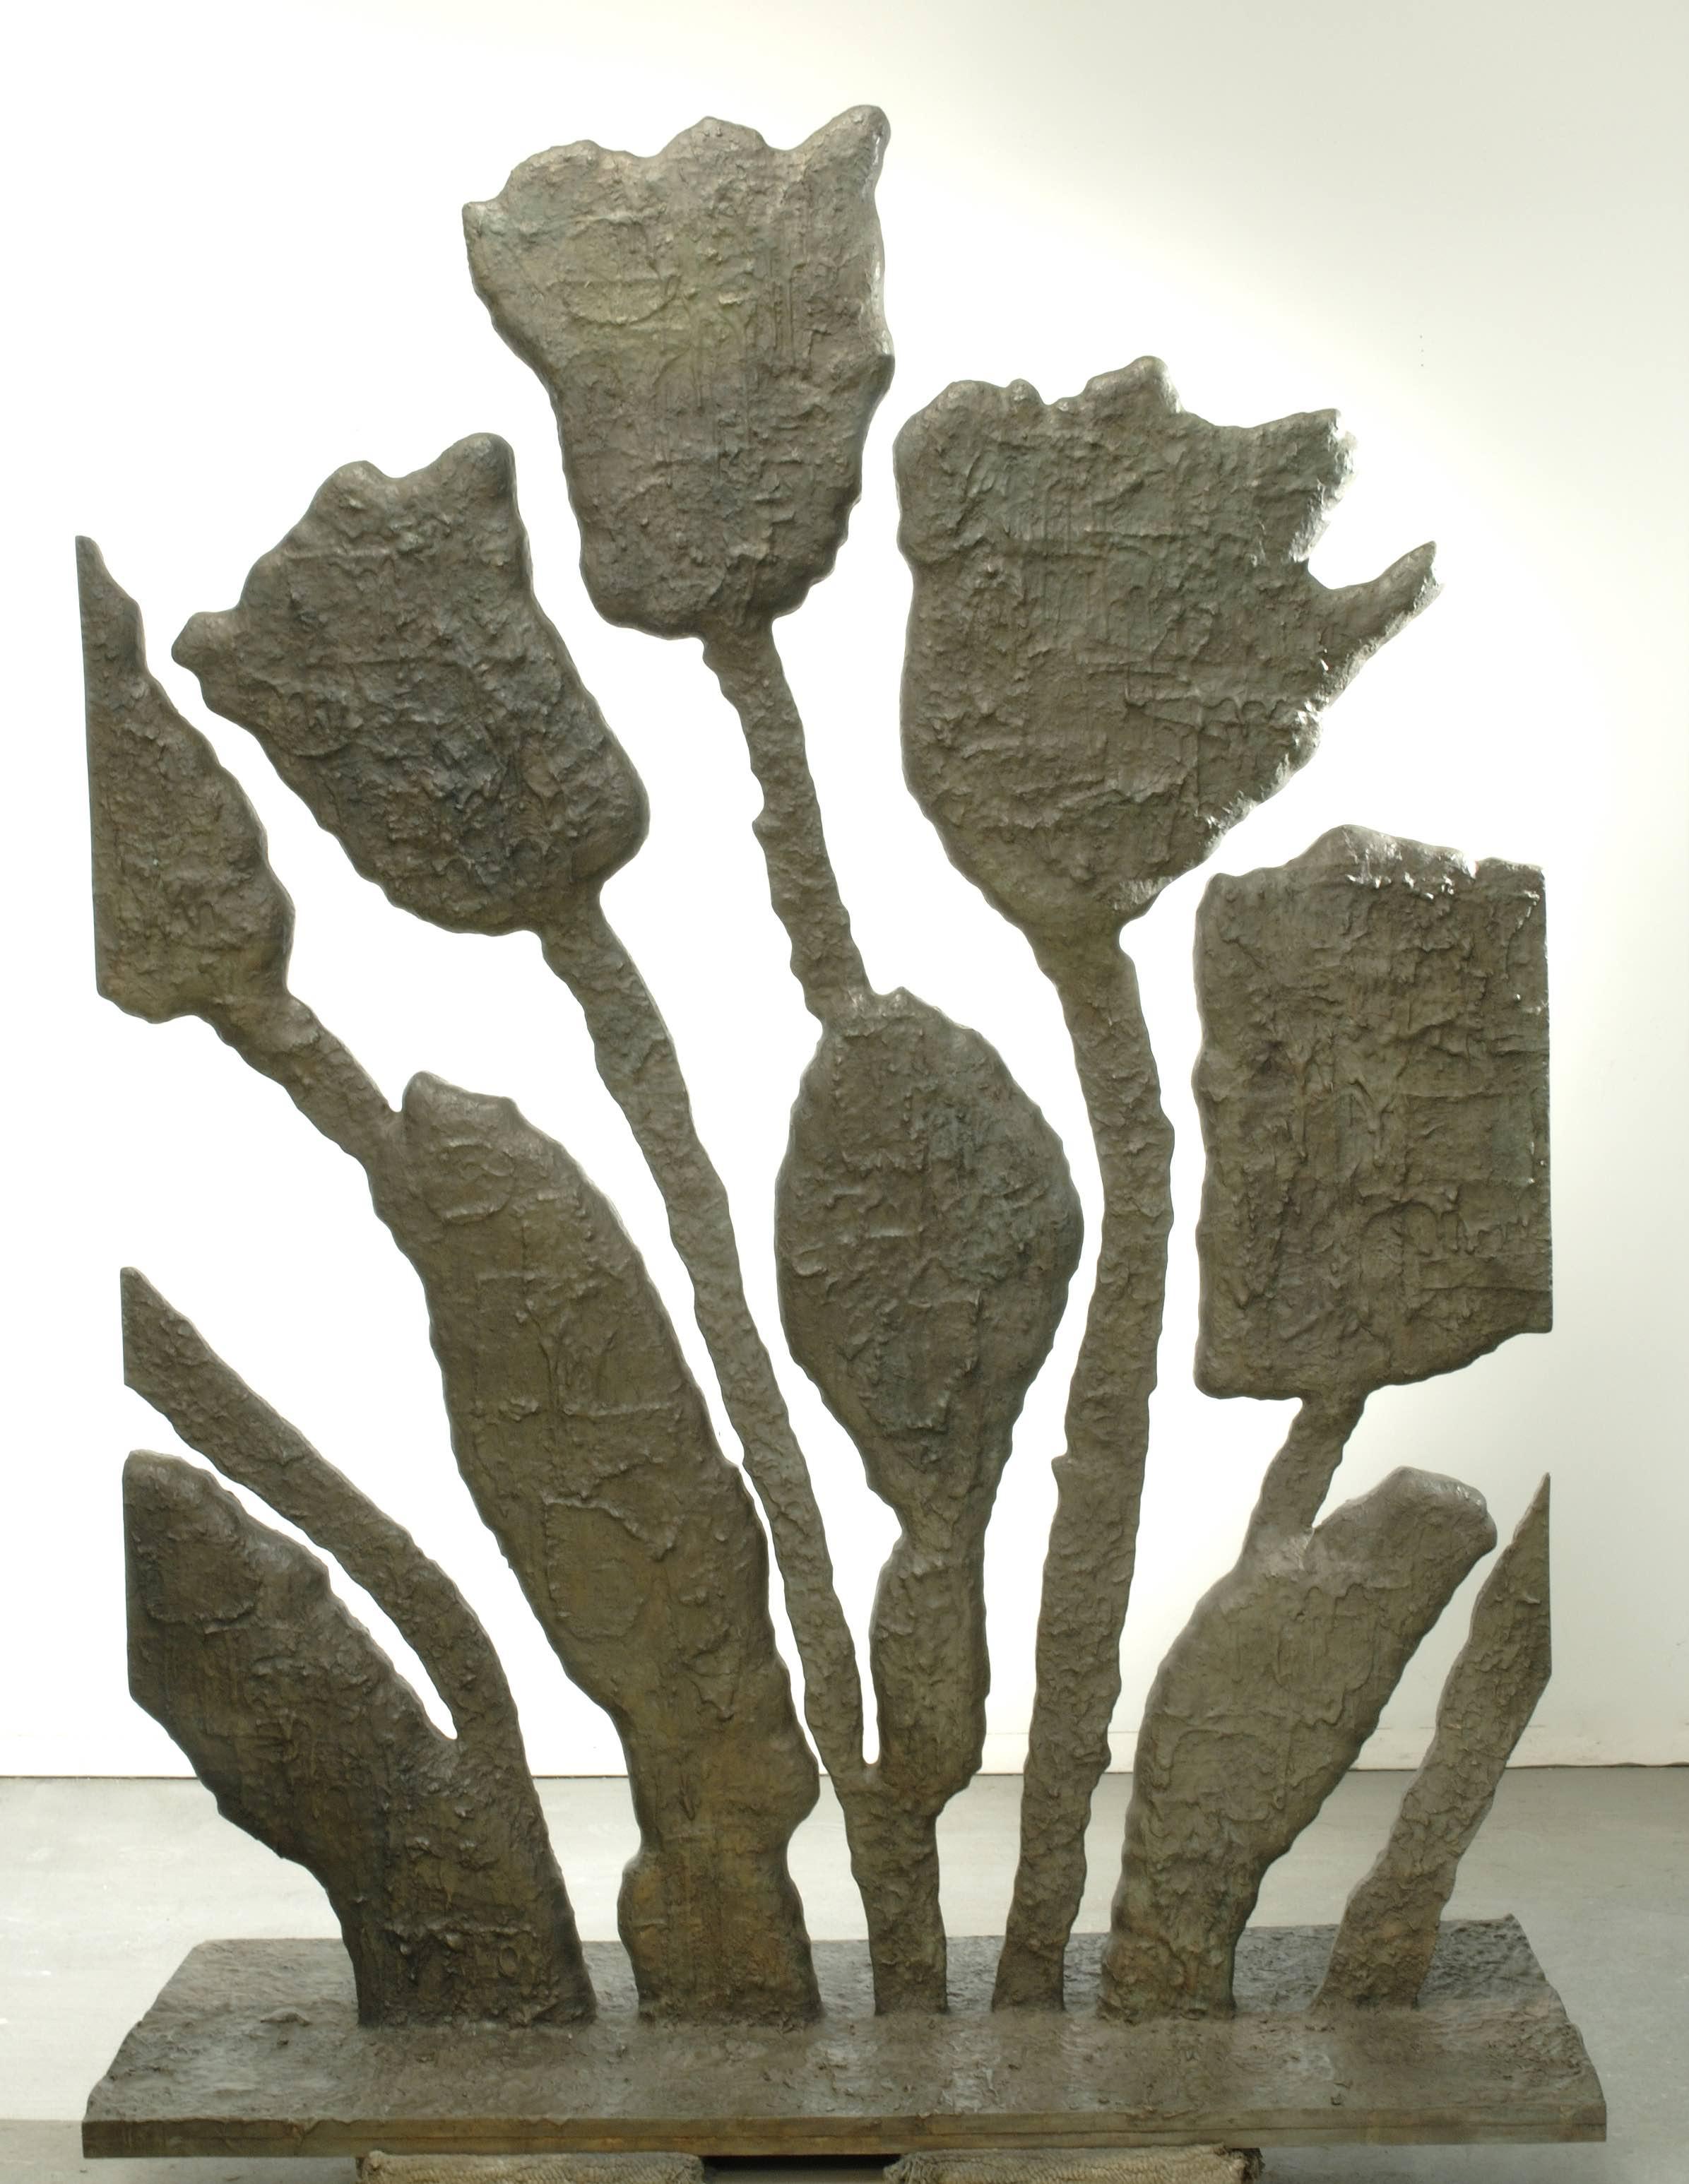 Donald Baechler   Flowers (Cut Sides)   2007  cast bronze  72 x 54 x 18 in / 183 x 137 x 46 cm  Edition of 8 + 2 APs